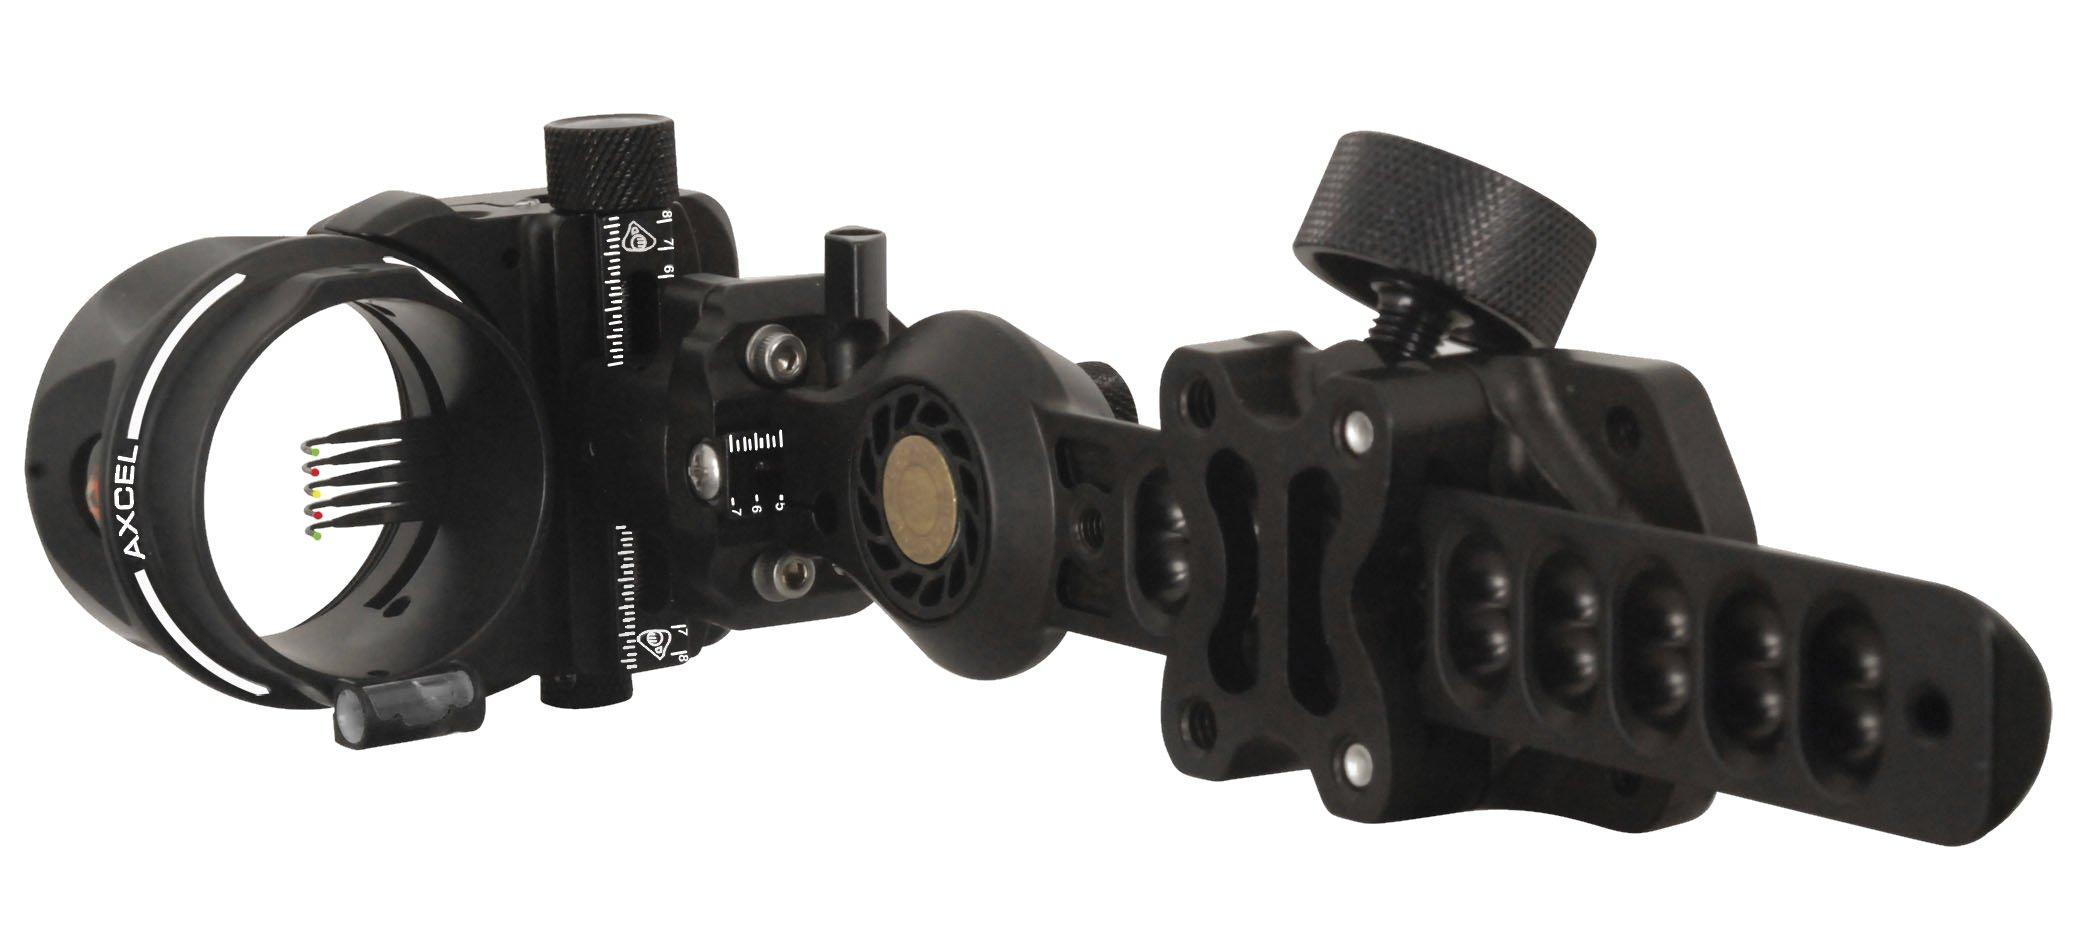 Axcel 5 Pin .019 Fiber Armortech HD PRO Hunting Sight (Black)